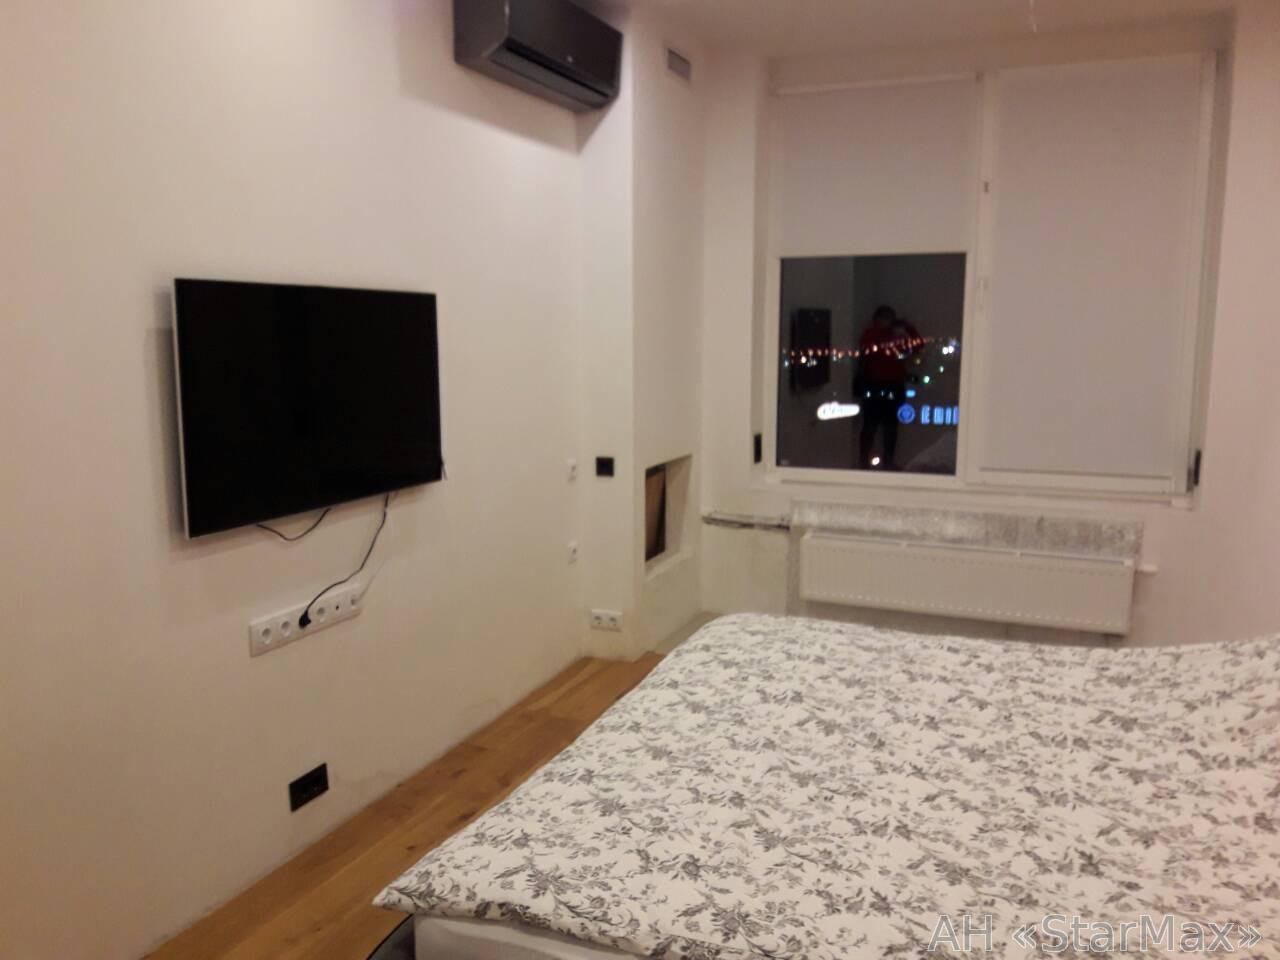 Продам квартиру Киев, Богатырская ул. 2